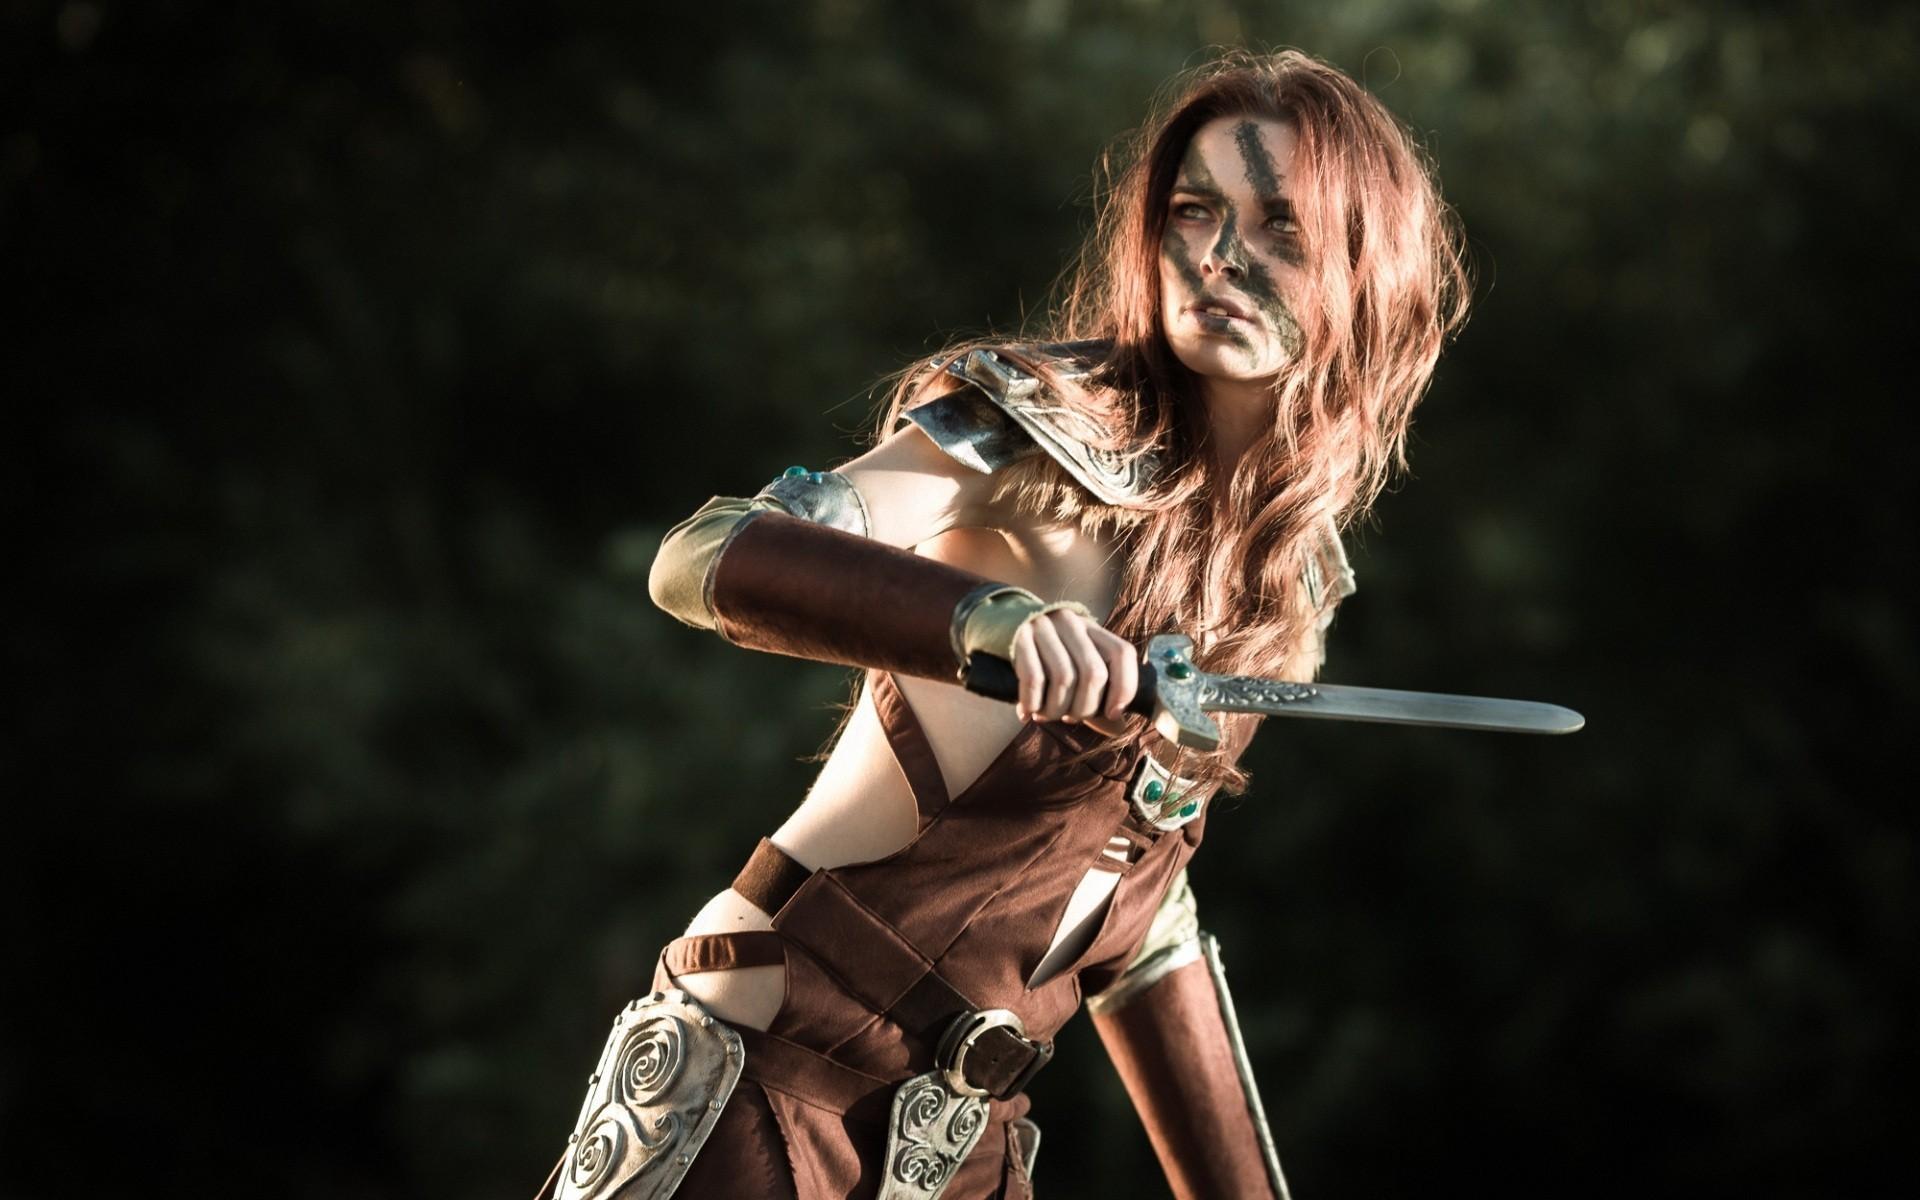 Aela The Huntress Daggers Dragonborn Freckles Redheads Elder Scrolls V  Skyrim Warriors Women